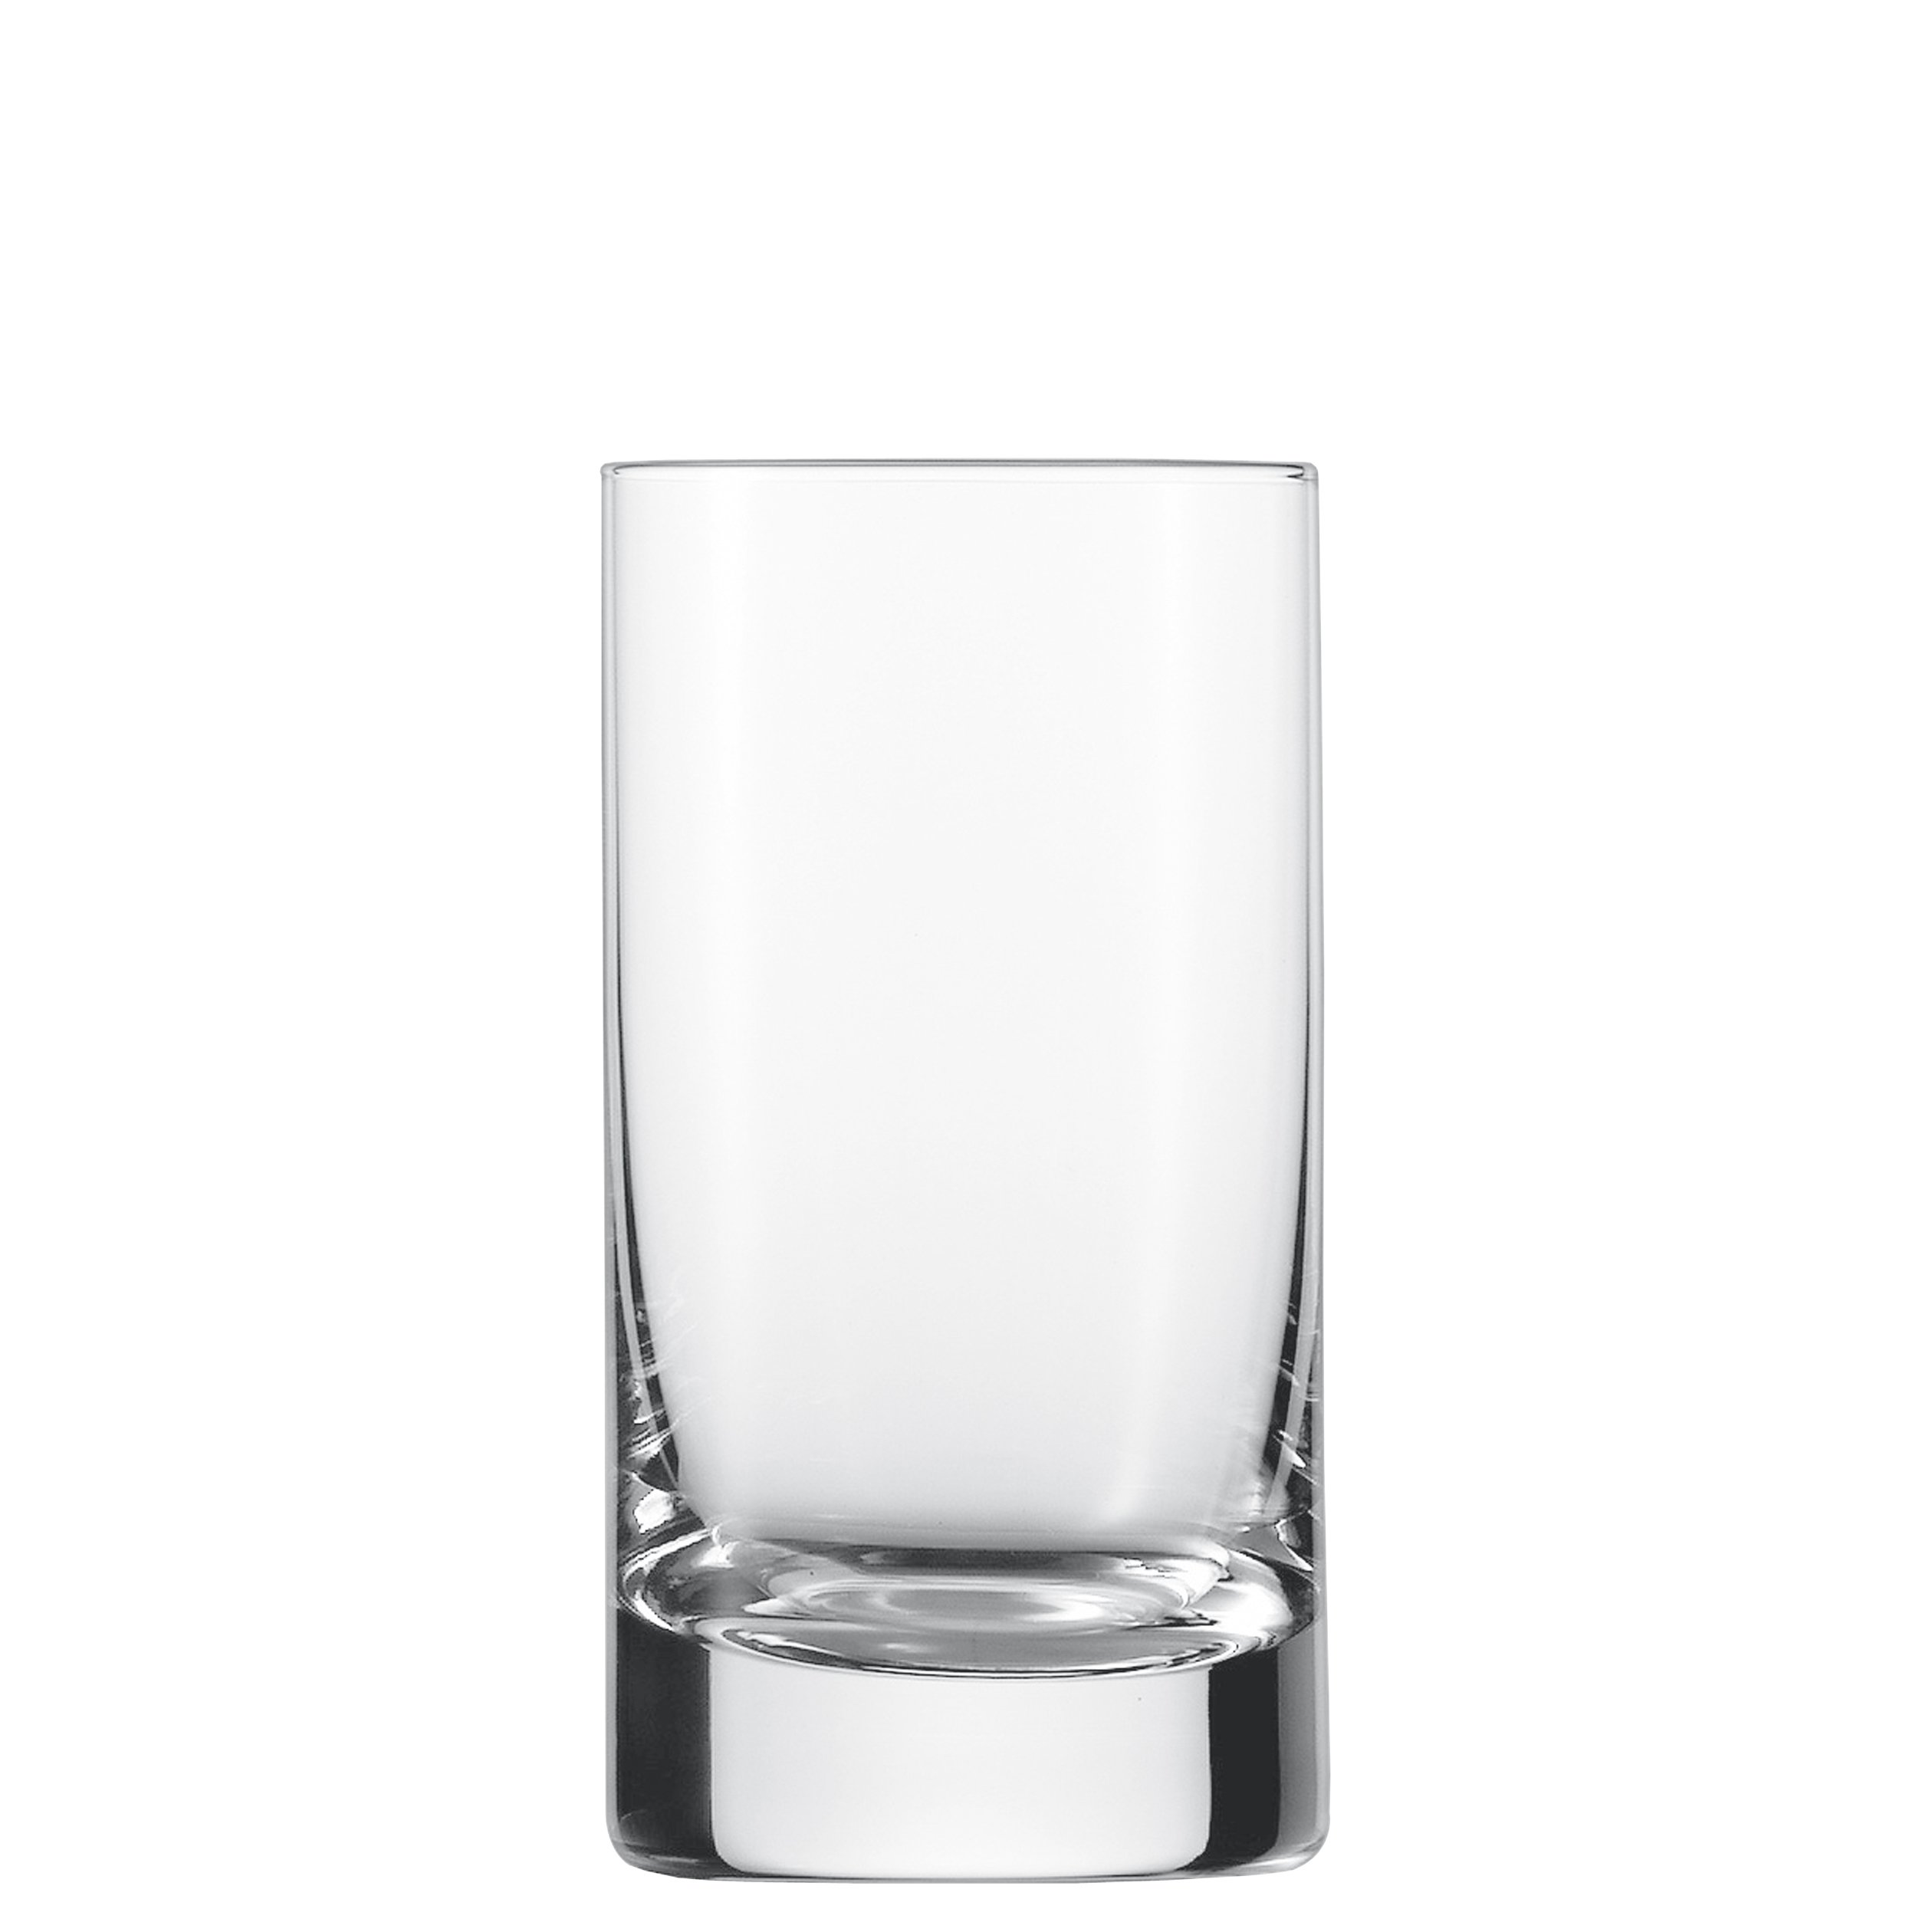 Schott Zwiesel Tritan Crystal Glass Paris Barware Collection Highball Cocktail Glass, 8.1-Ounce, Set of 6